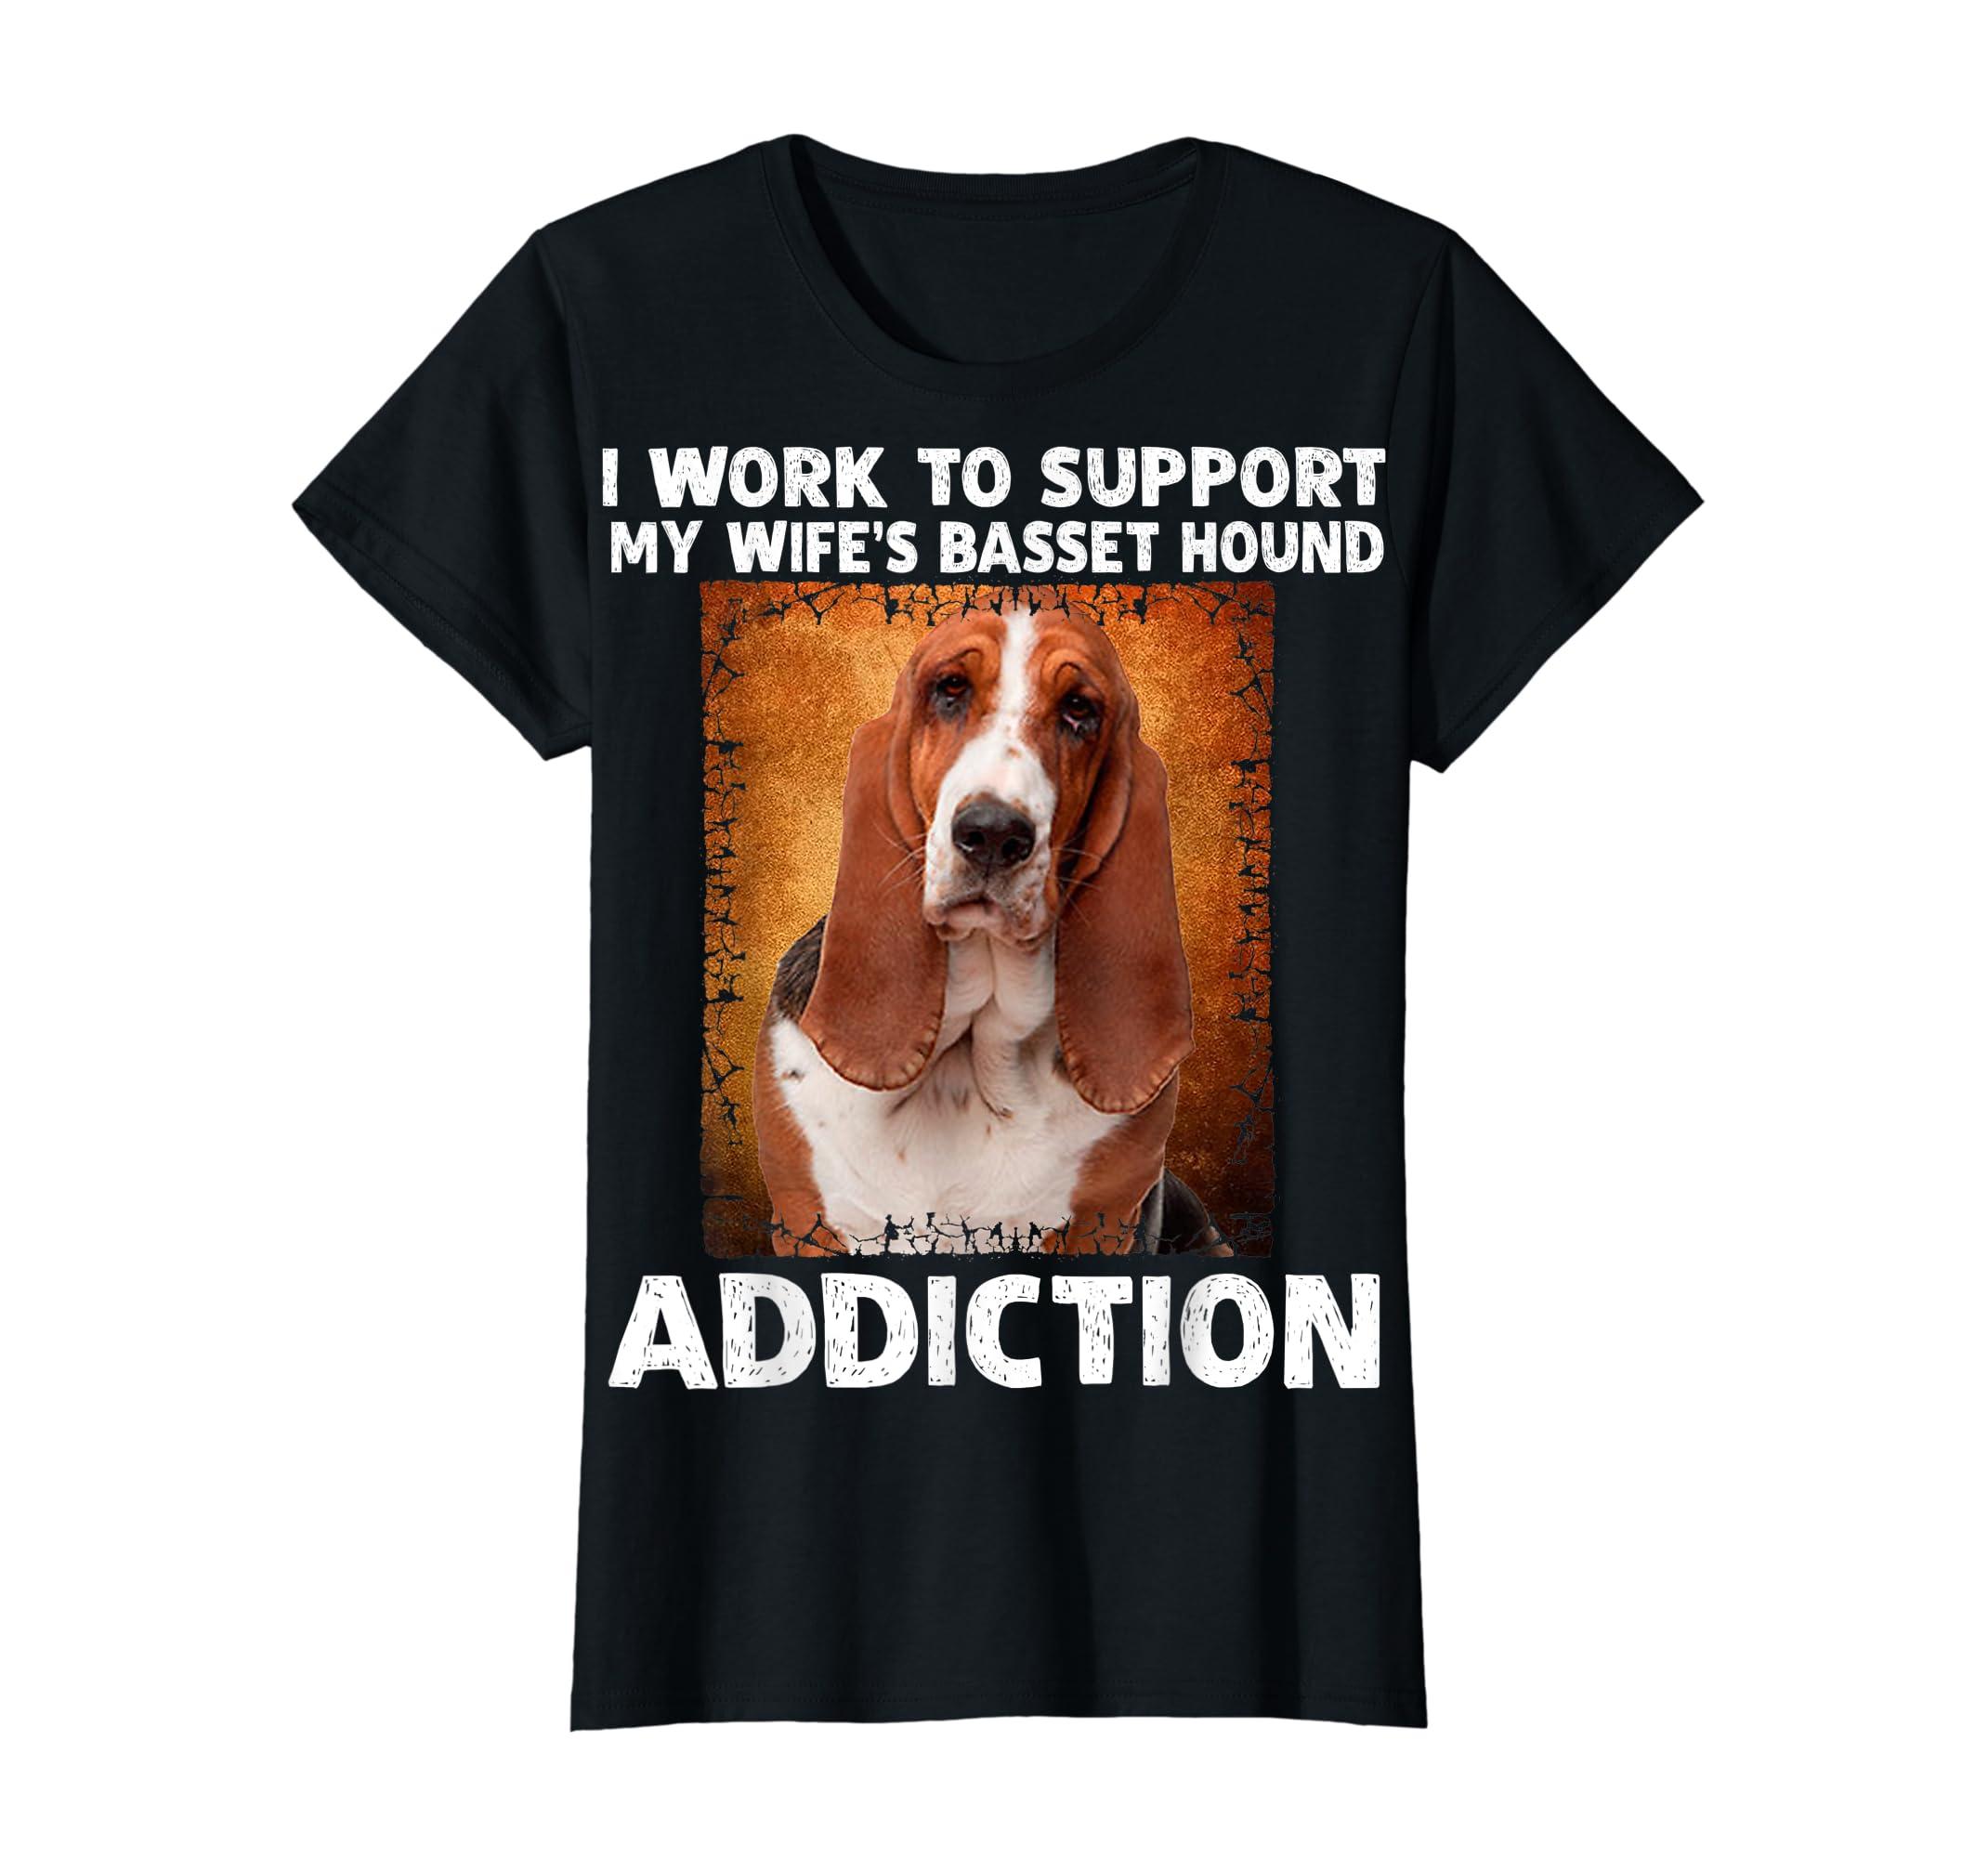 I Support My Wife Basset Hound Addiction T-Shirt-Women's T-Shirt-Black